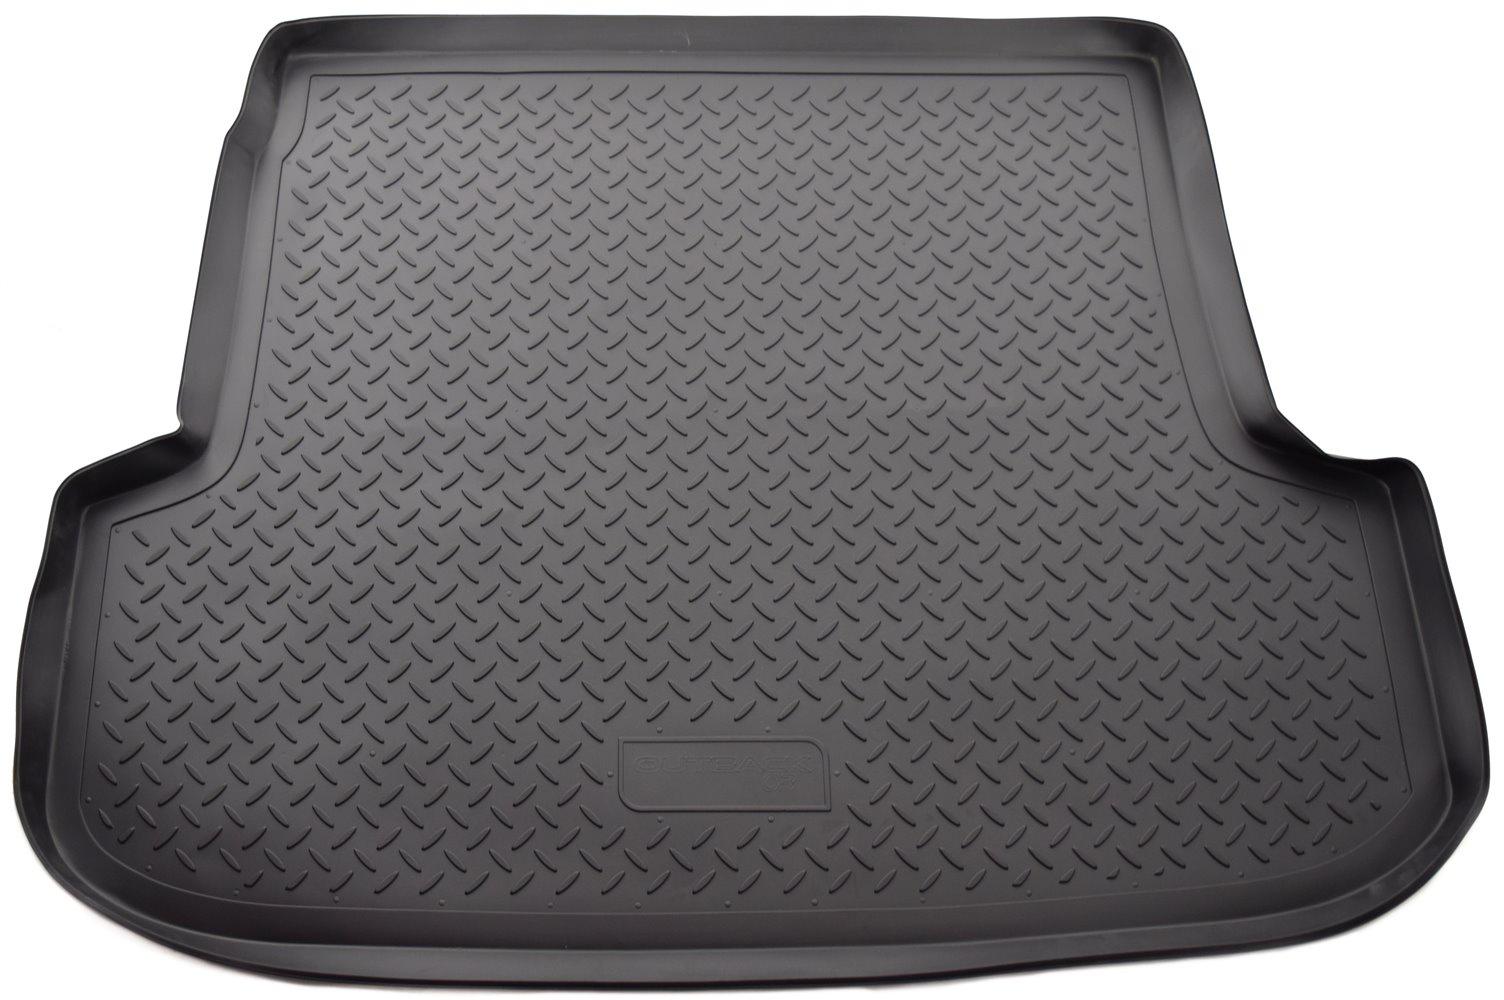 Коврик багажника Norplast npl-p-85-23, для Suzuki Grand Vitara (2005) (3 дв), черный коврик багажника полиуретан чёрный 2awd norplast npl p 69 04 для renault duster 2011